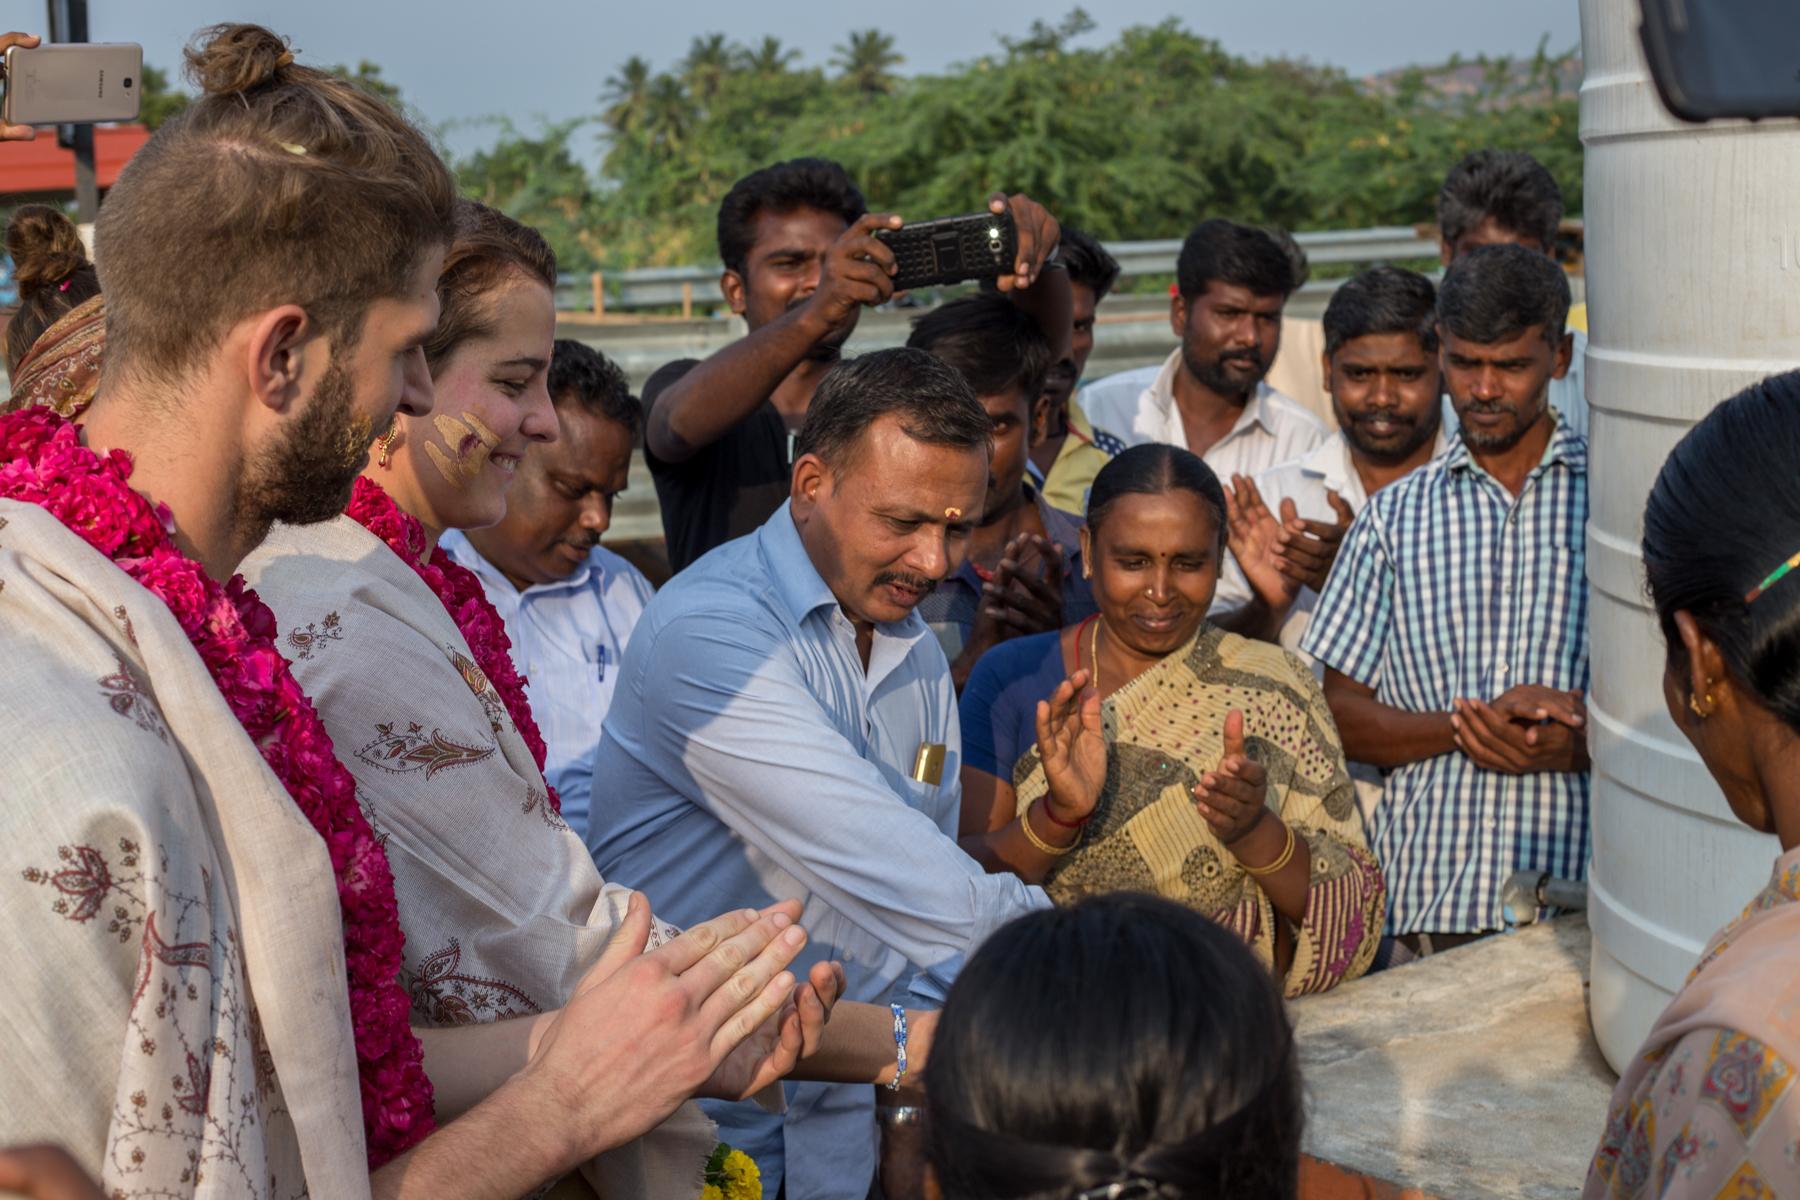 Inde-association-kynarou-eau-inauguration